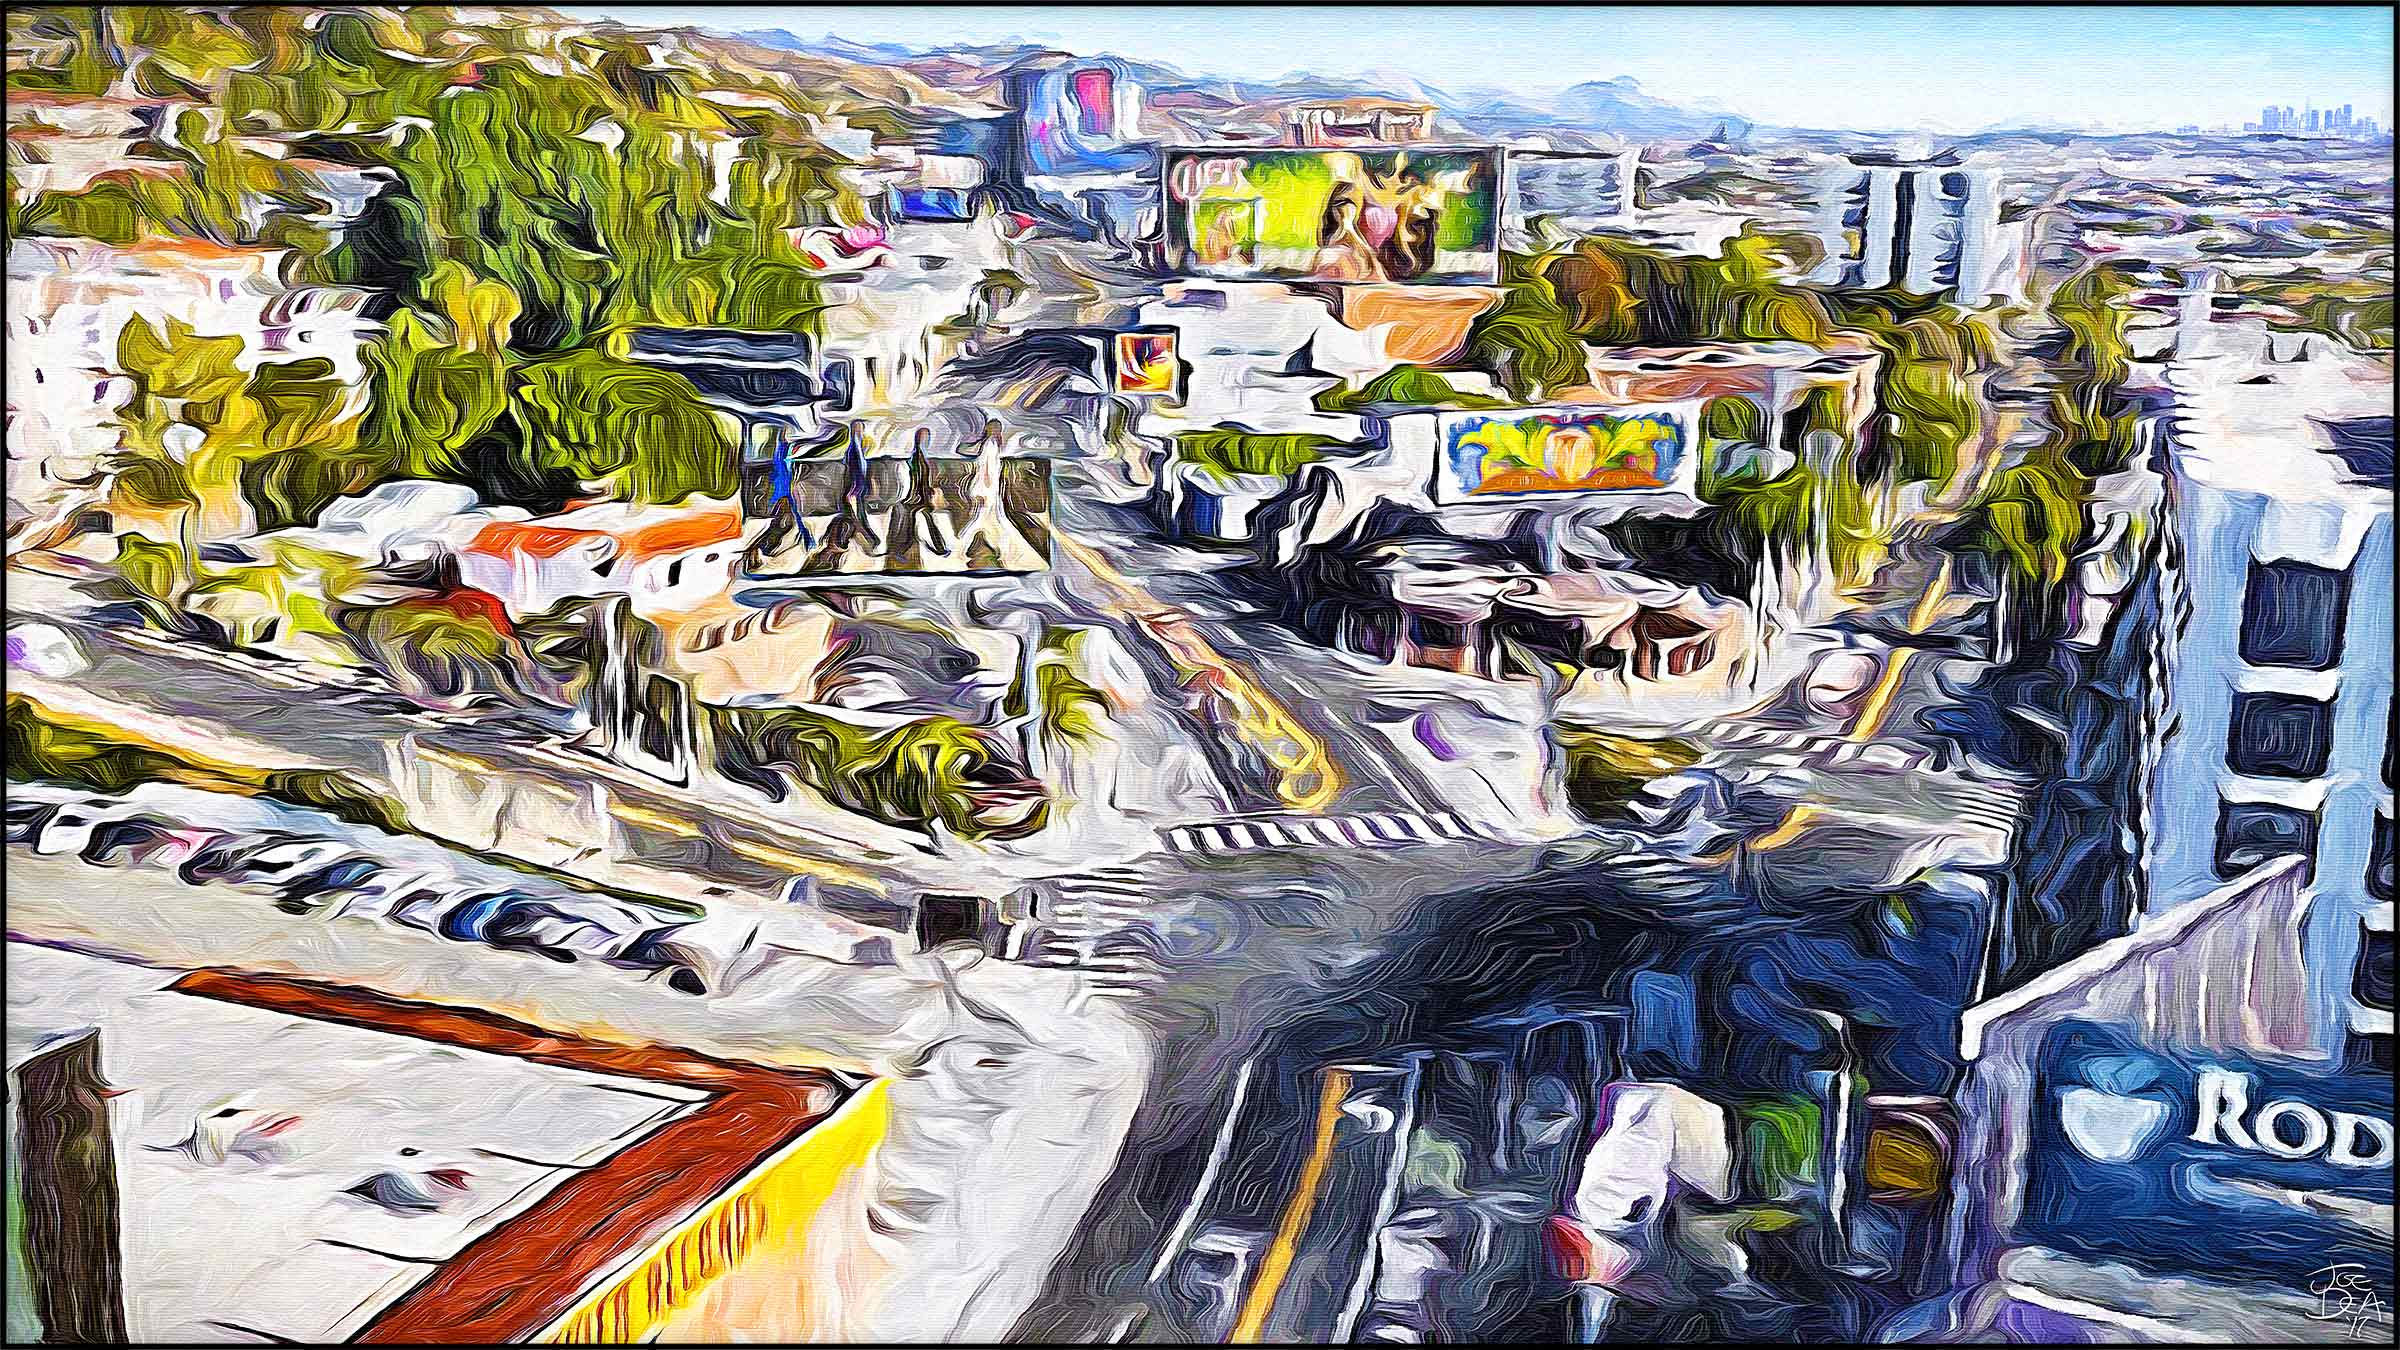 West Hollywood - Sunset & Holloway